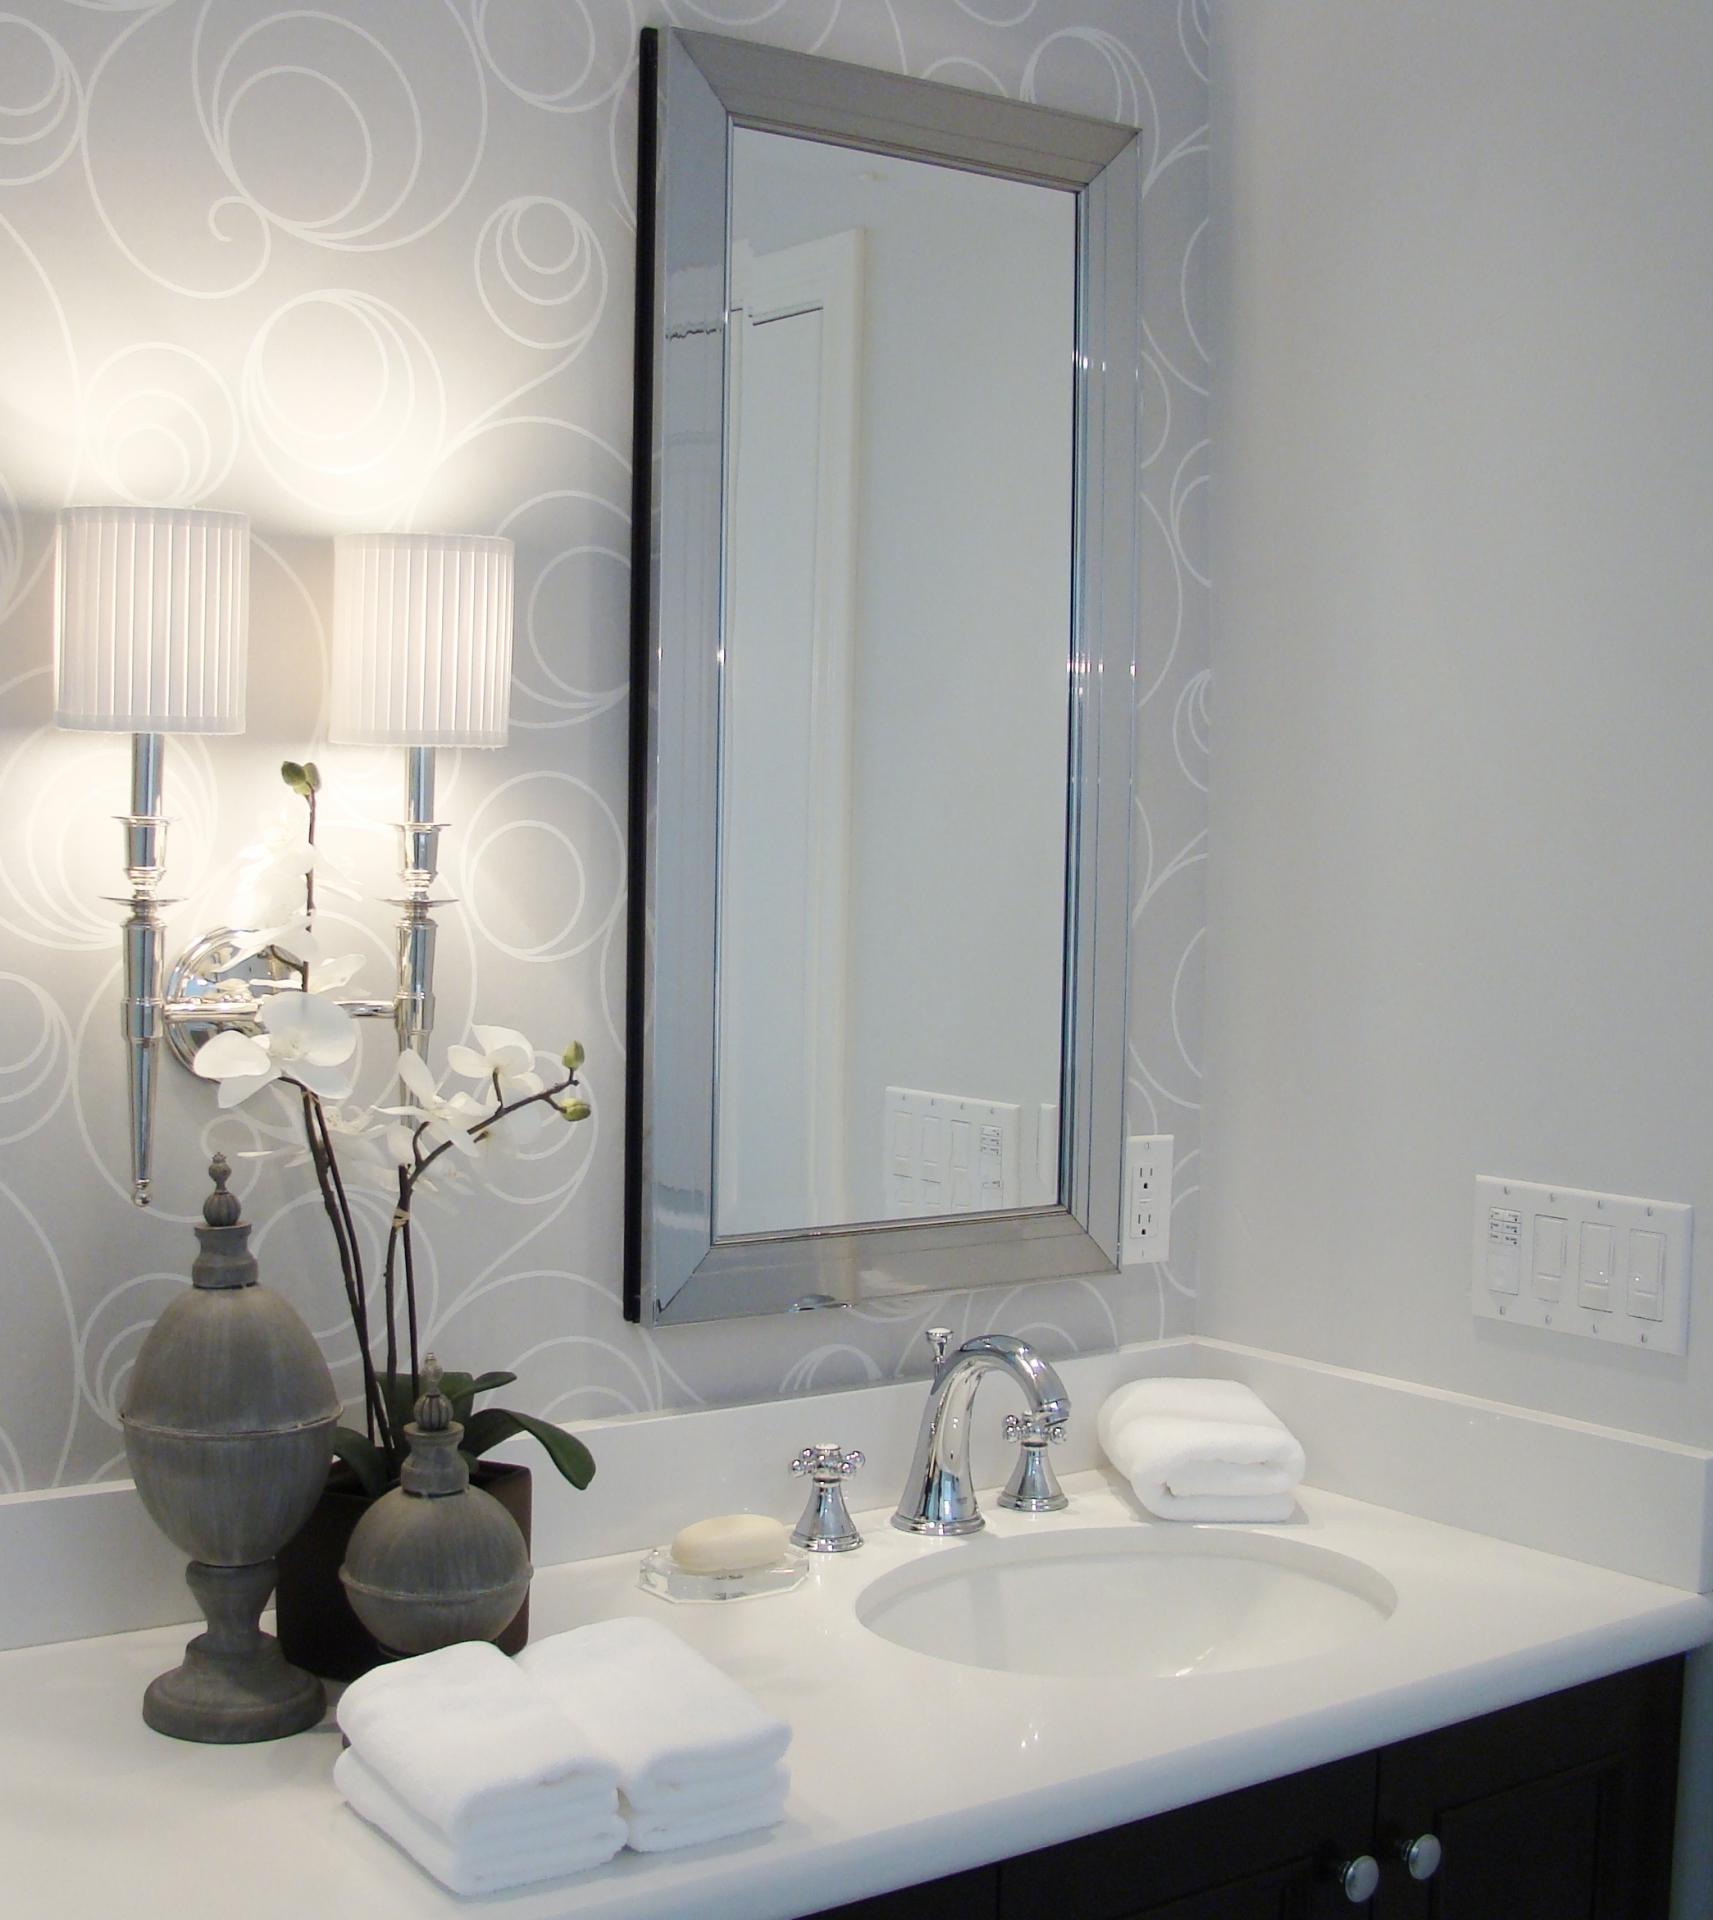 Fiorito Interior Design, interior design, remodel, master bathroom, white and grey, custom vanity, sconce, framed mirror medicine chest, wallpaper